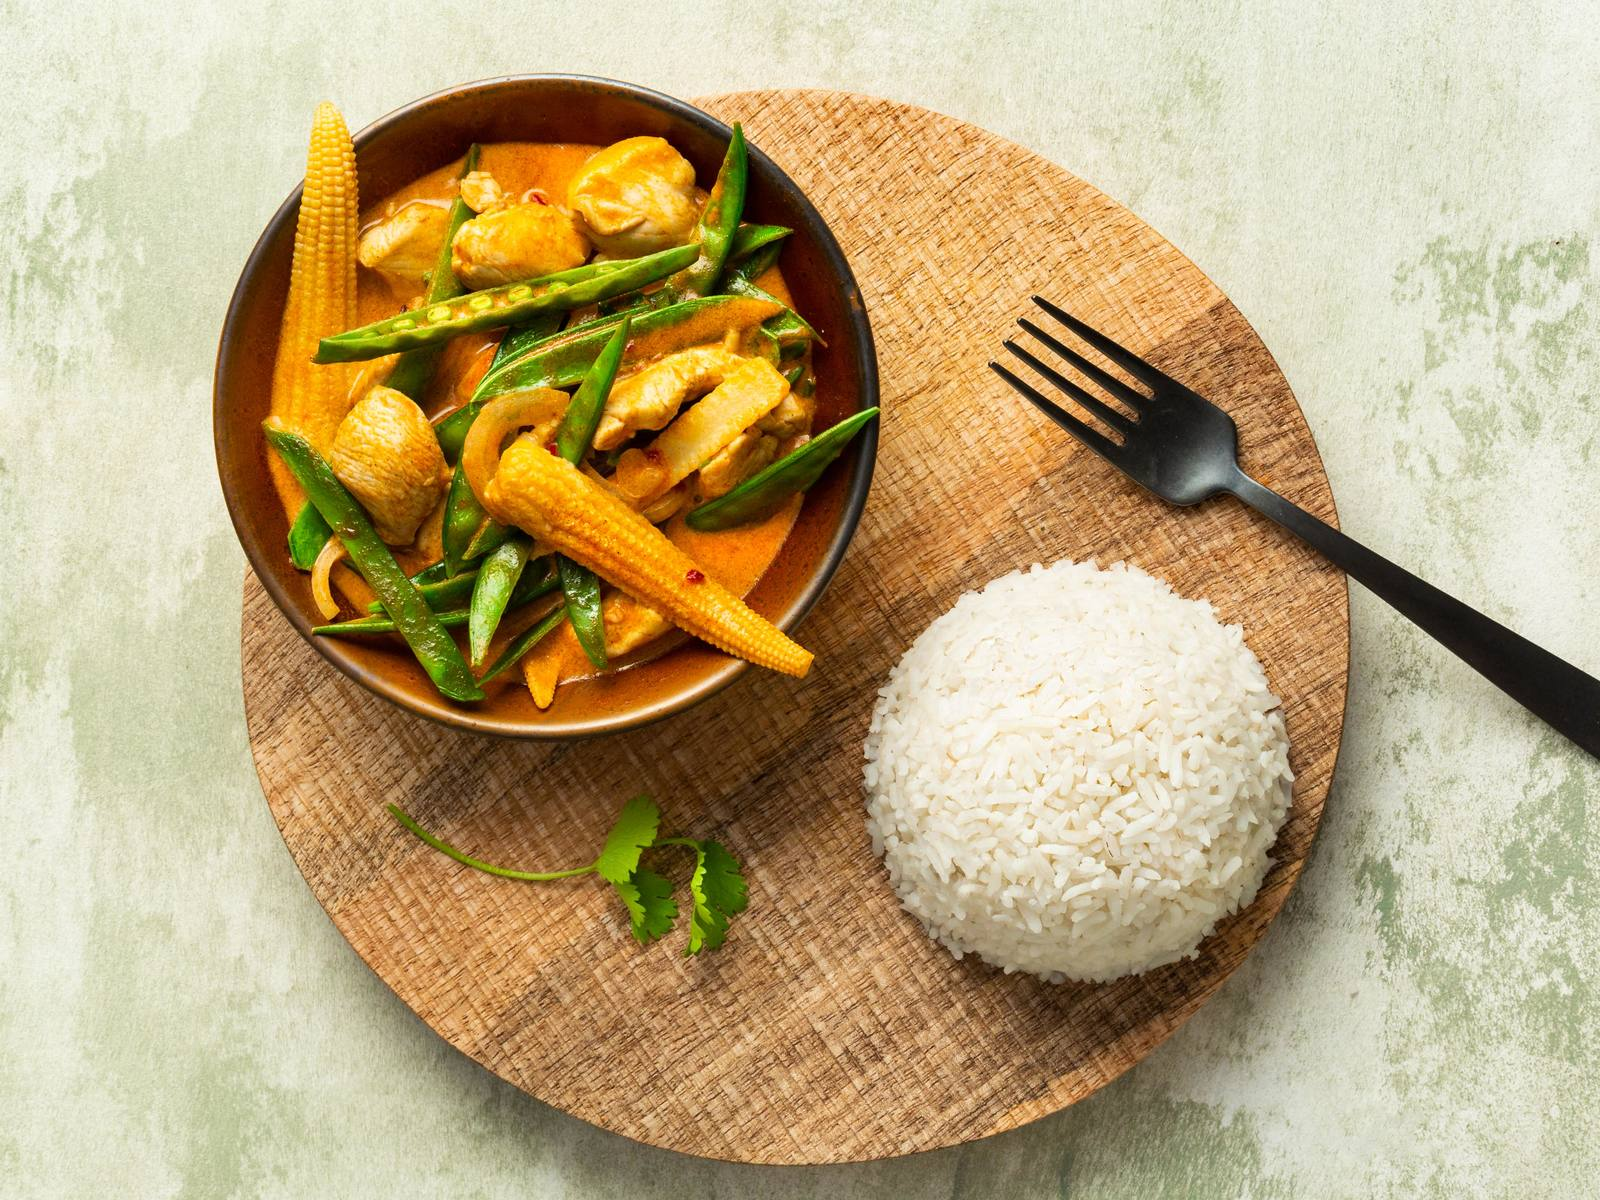 Thaise Rode Curry met kip en babymaïs